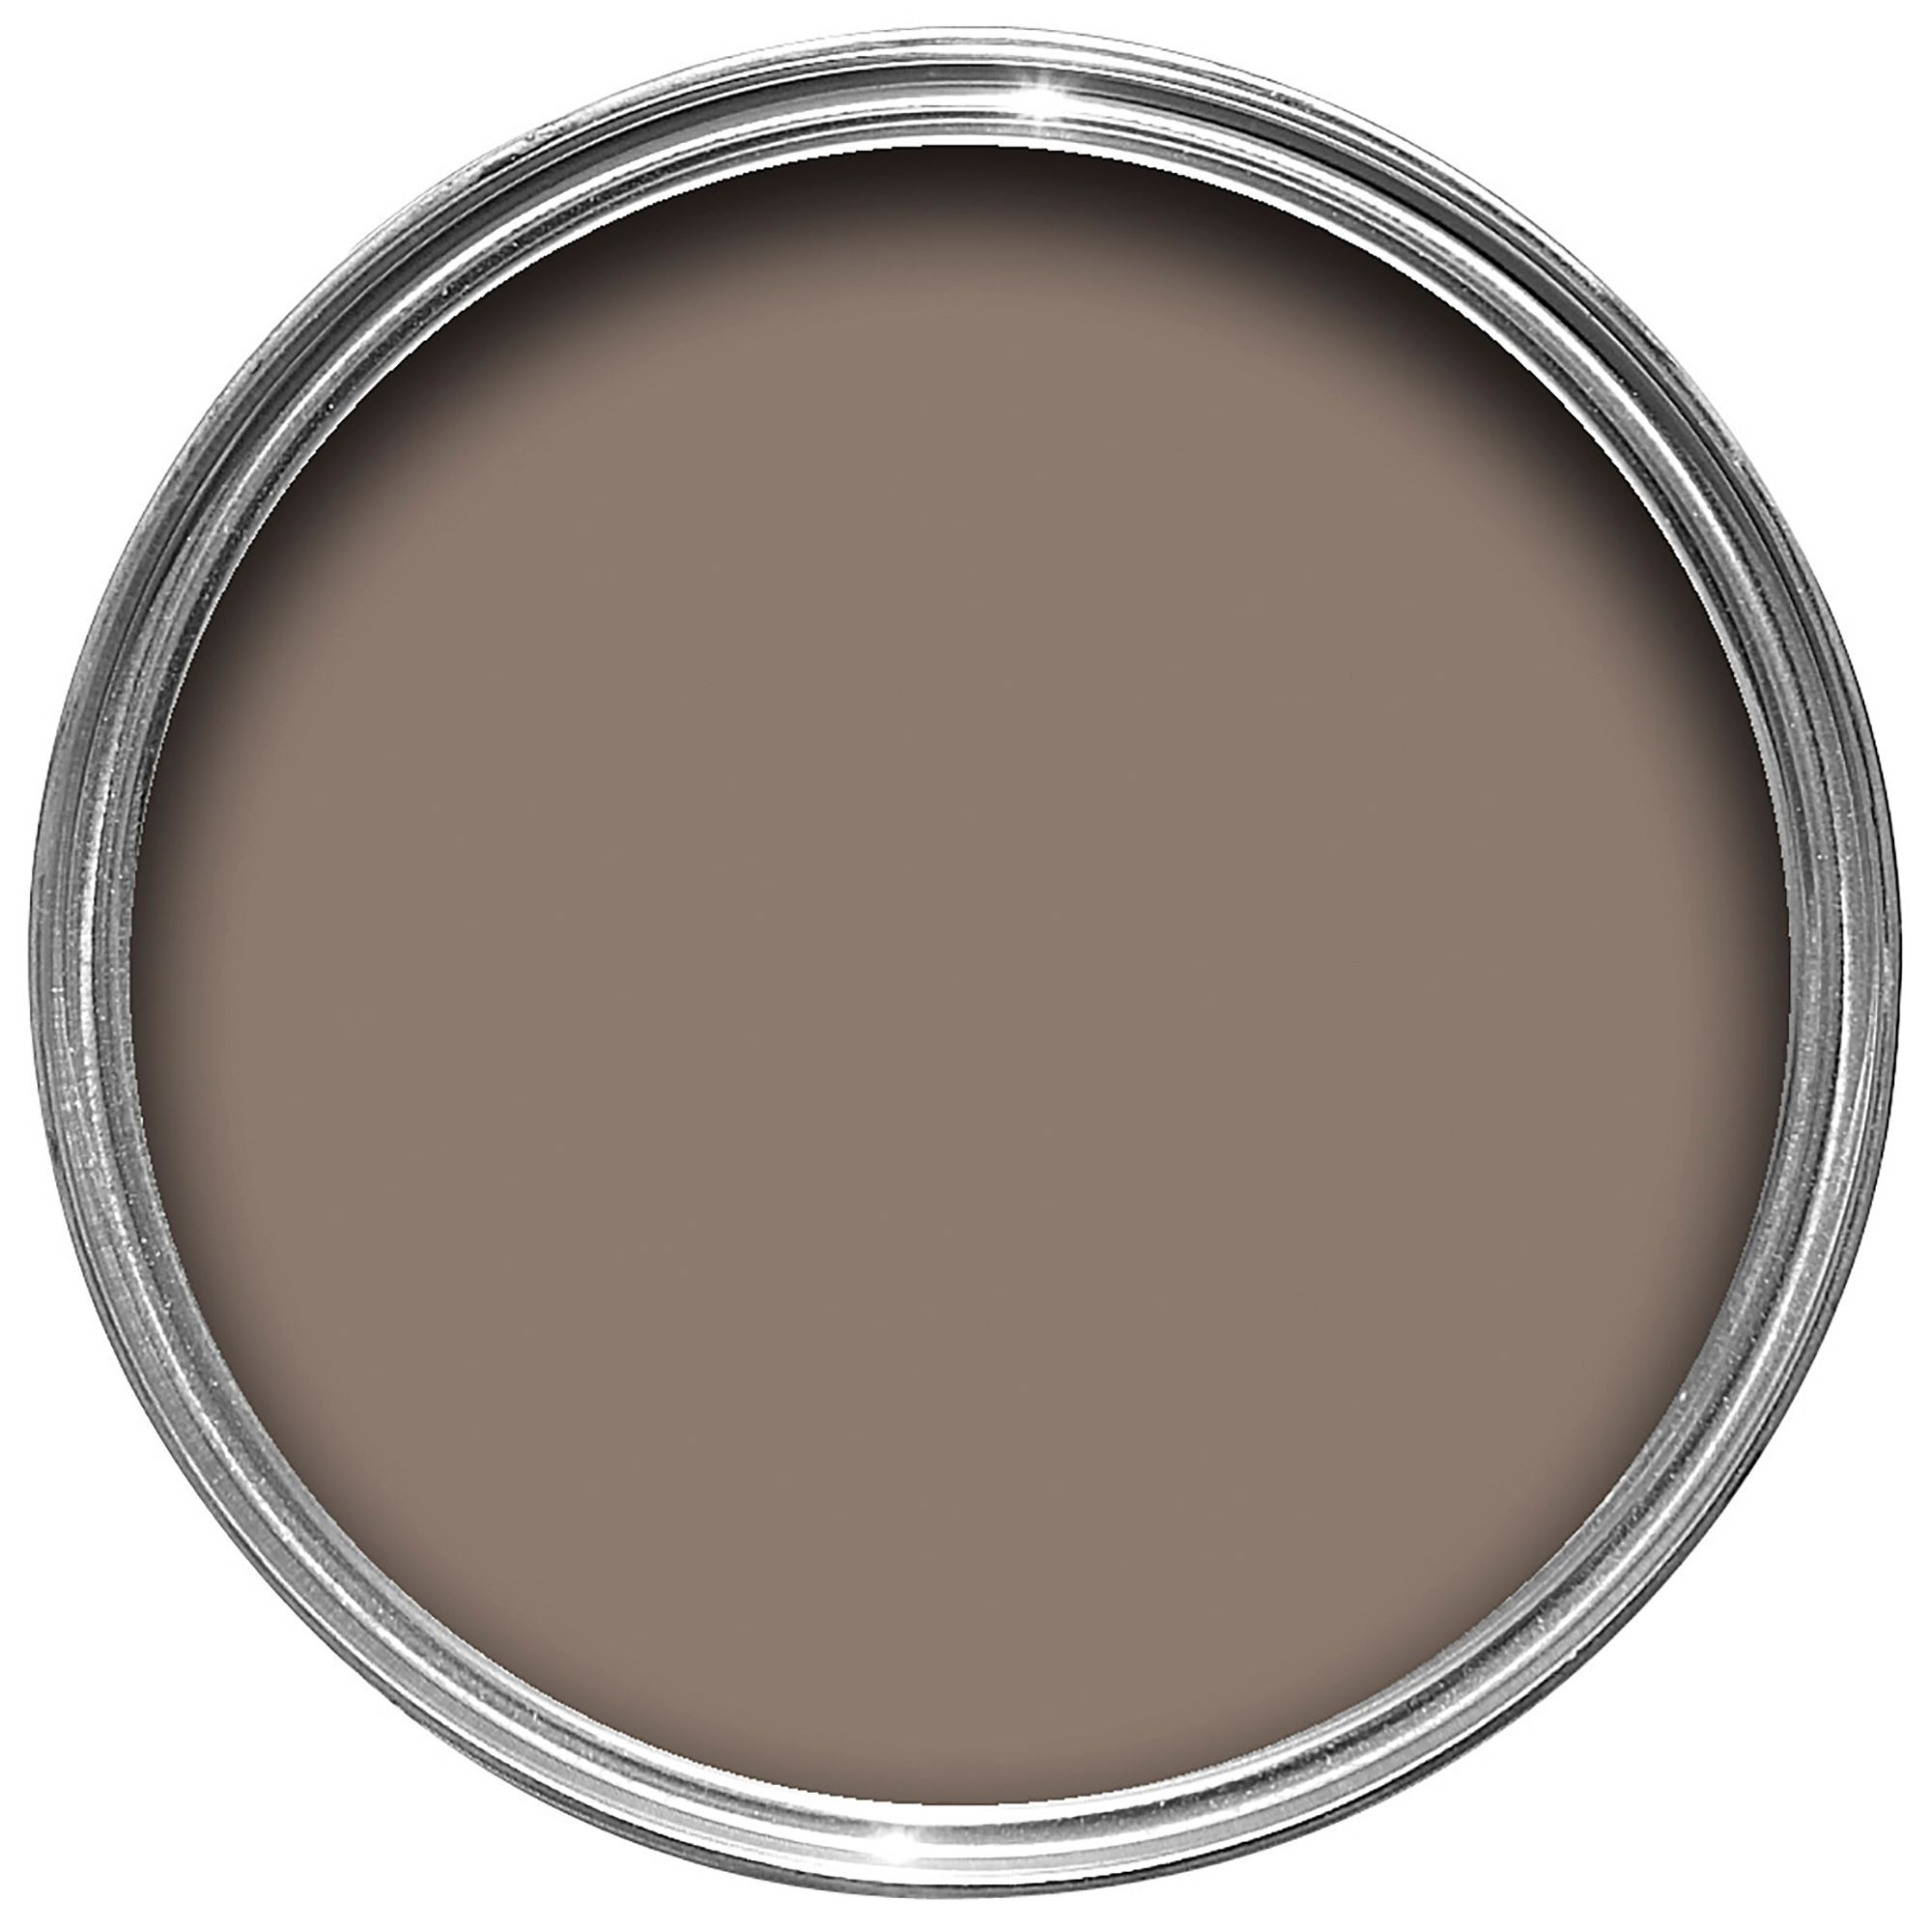 Sandtex mid stone brown smooth masonry paint 5l departments diy at b q - Sandtex exterior masonry paint design ...